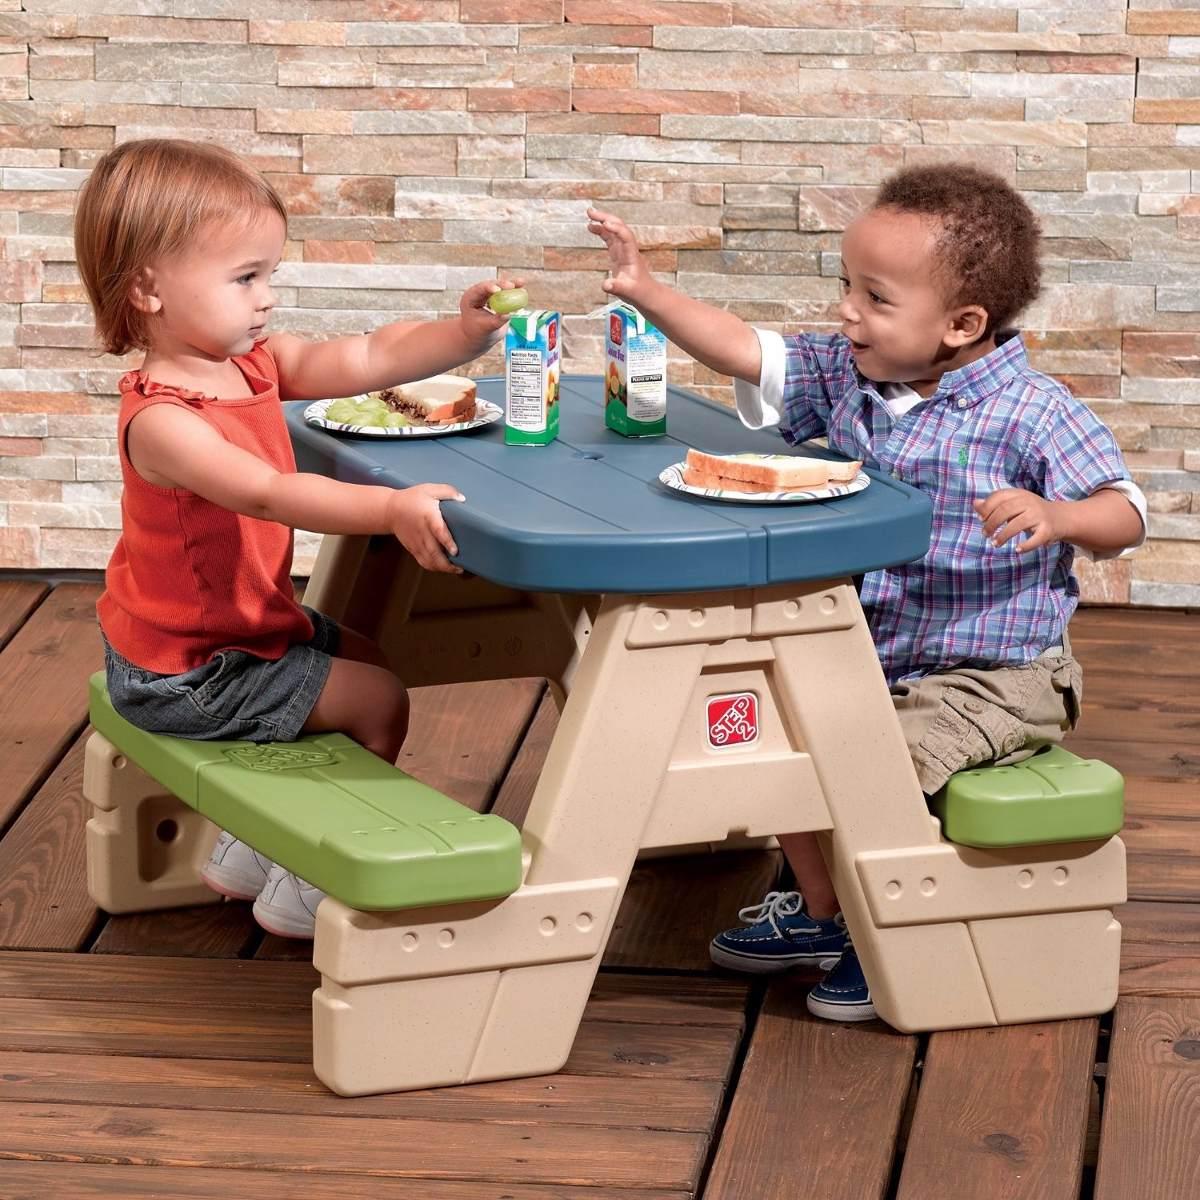 Juego mesa con 2 sillas sombrilla mesita silla infantil - Mesita con sillas infantiles ...